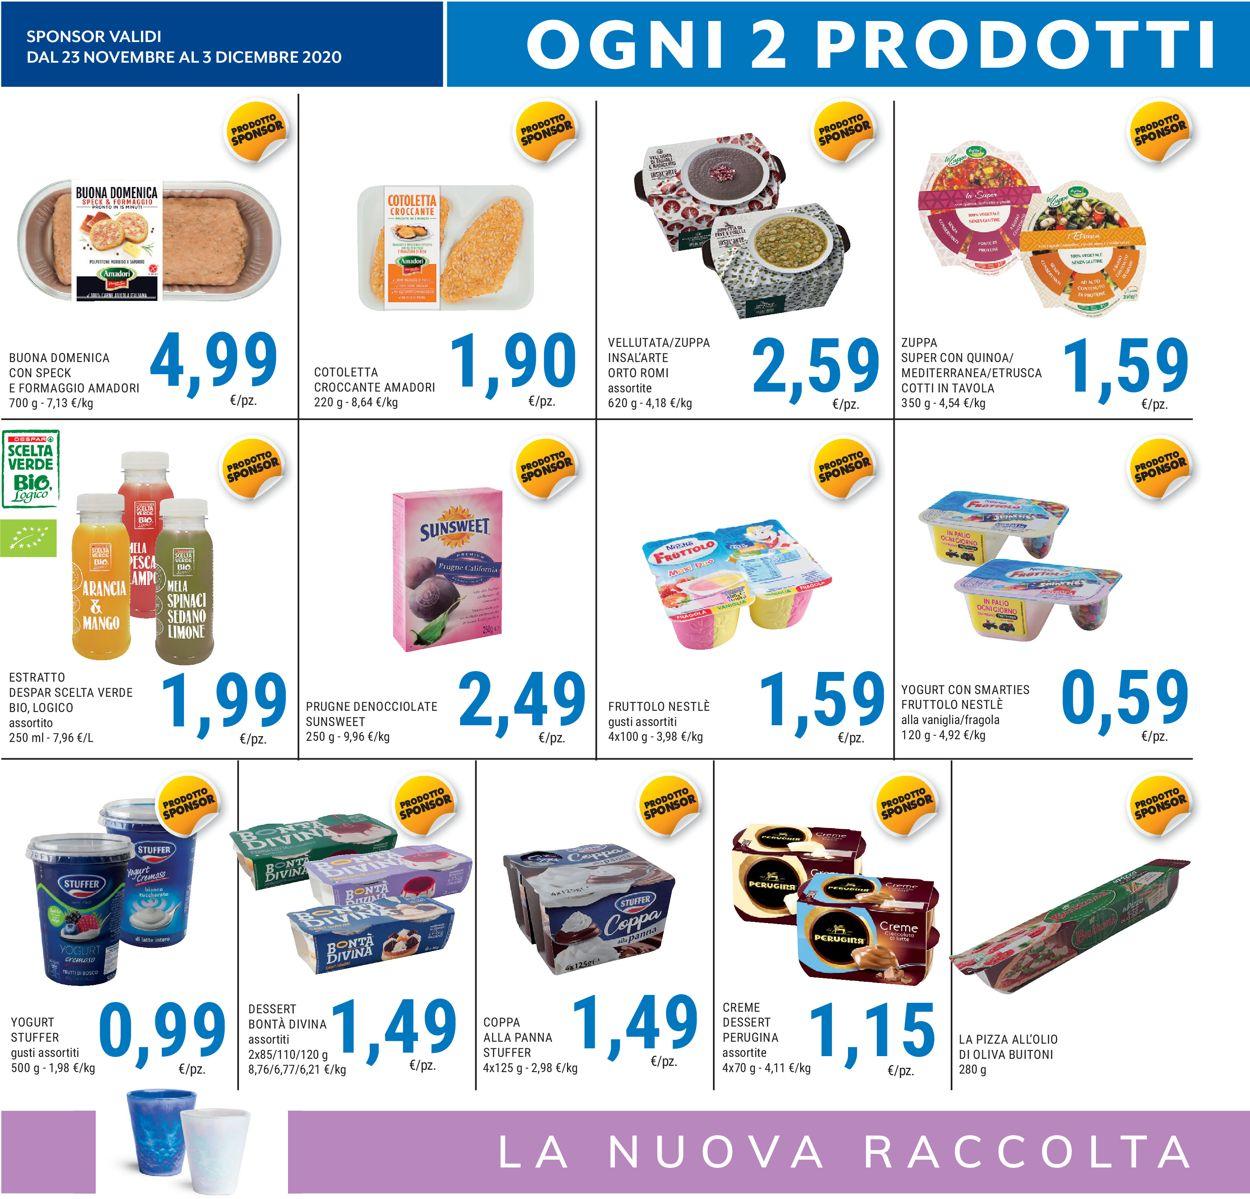 Volantino Interspar - Black Friday 2020 - Offerte 23/11-03/12/2020 (Pagina 4)